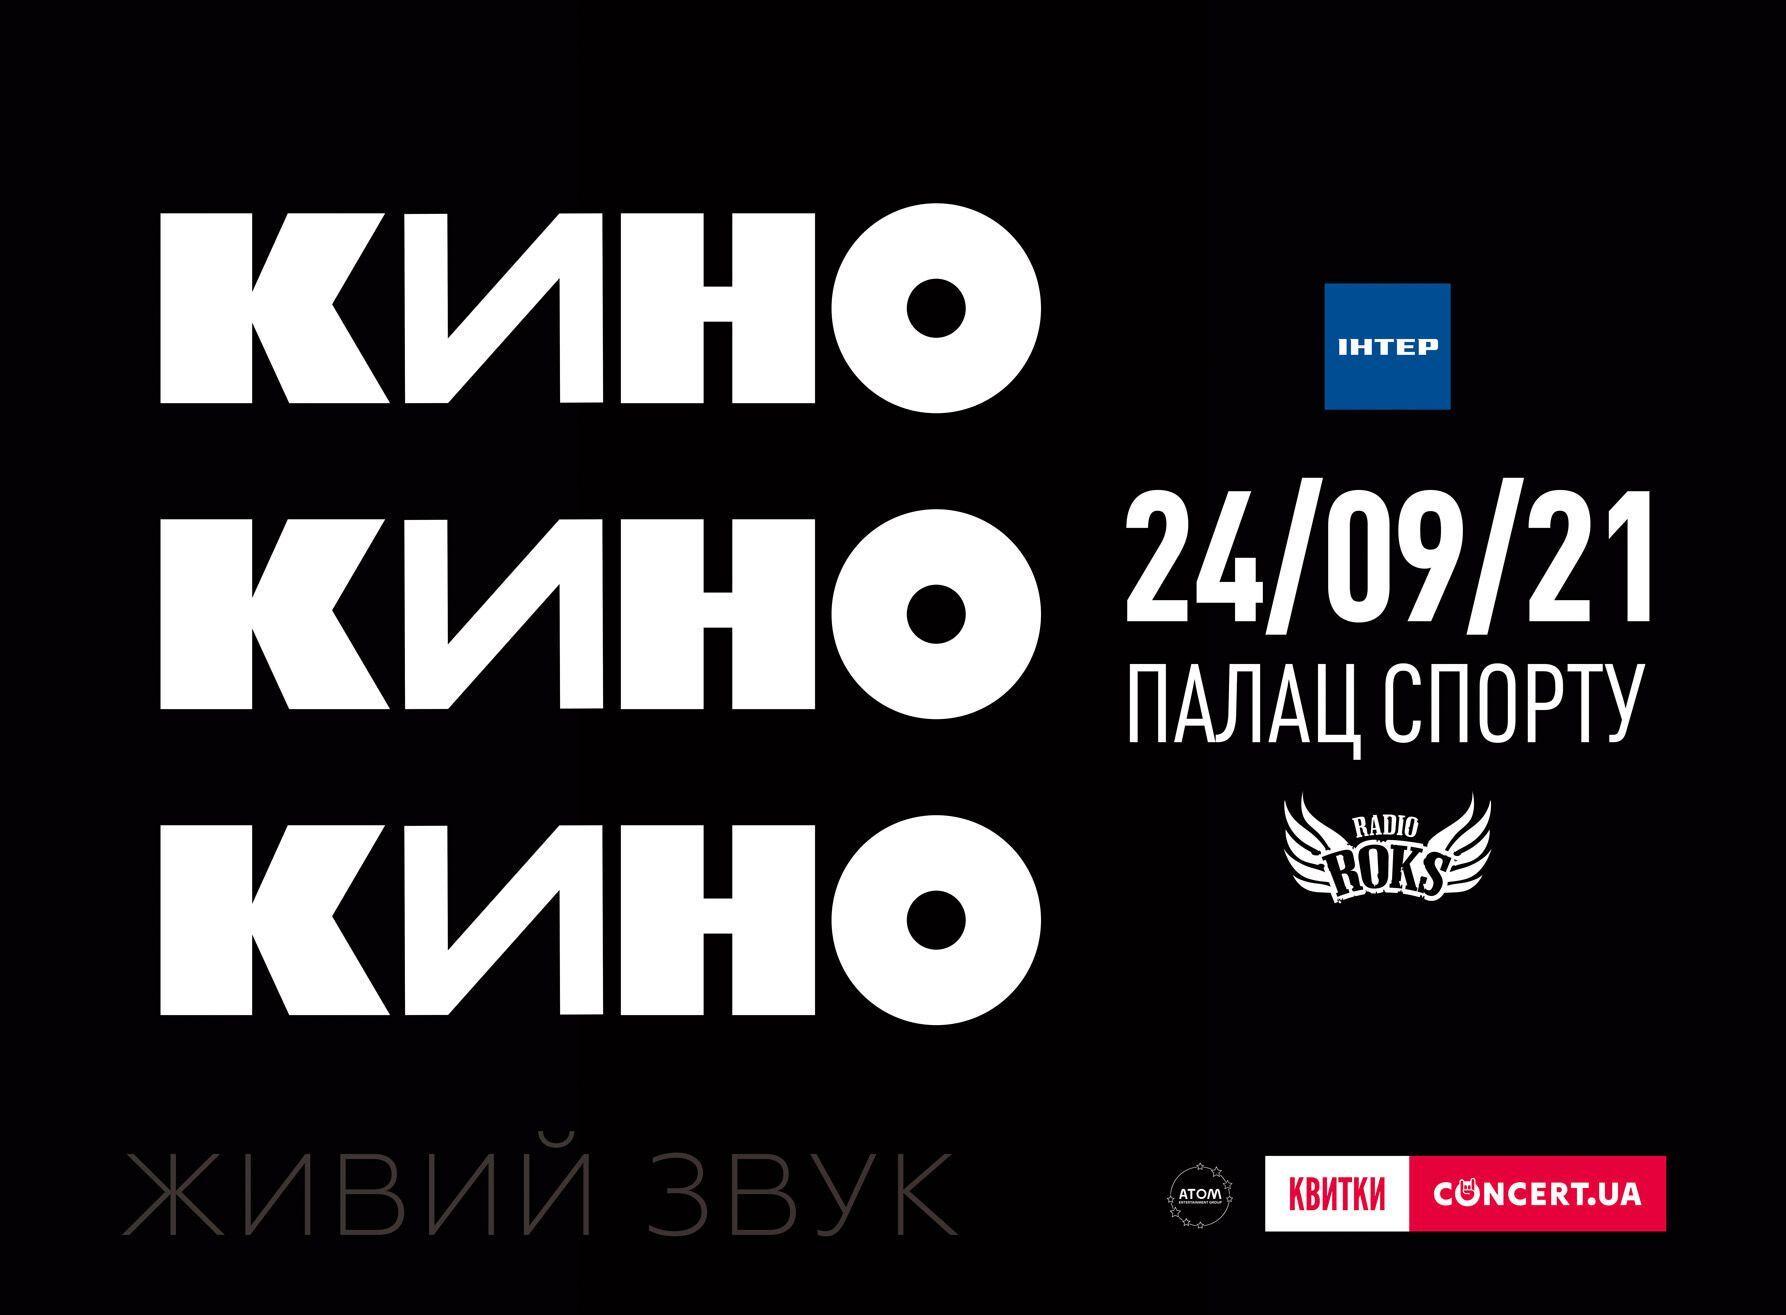 Квитки можна придбати на сайті concert.ua